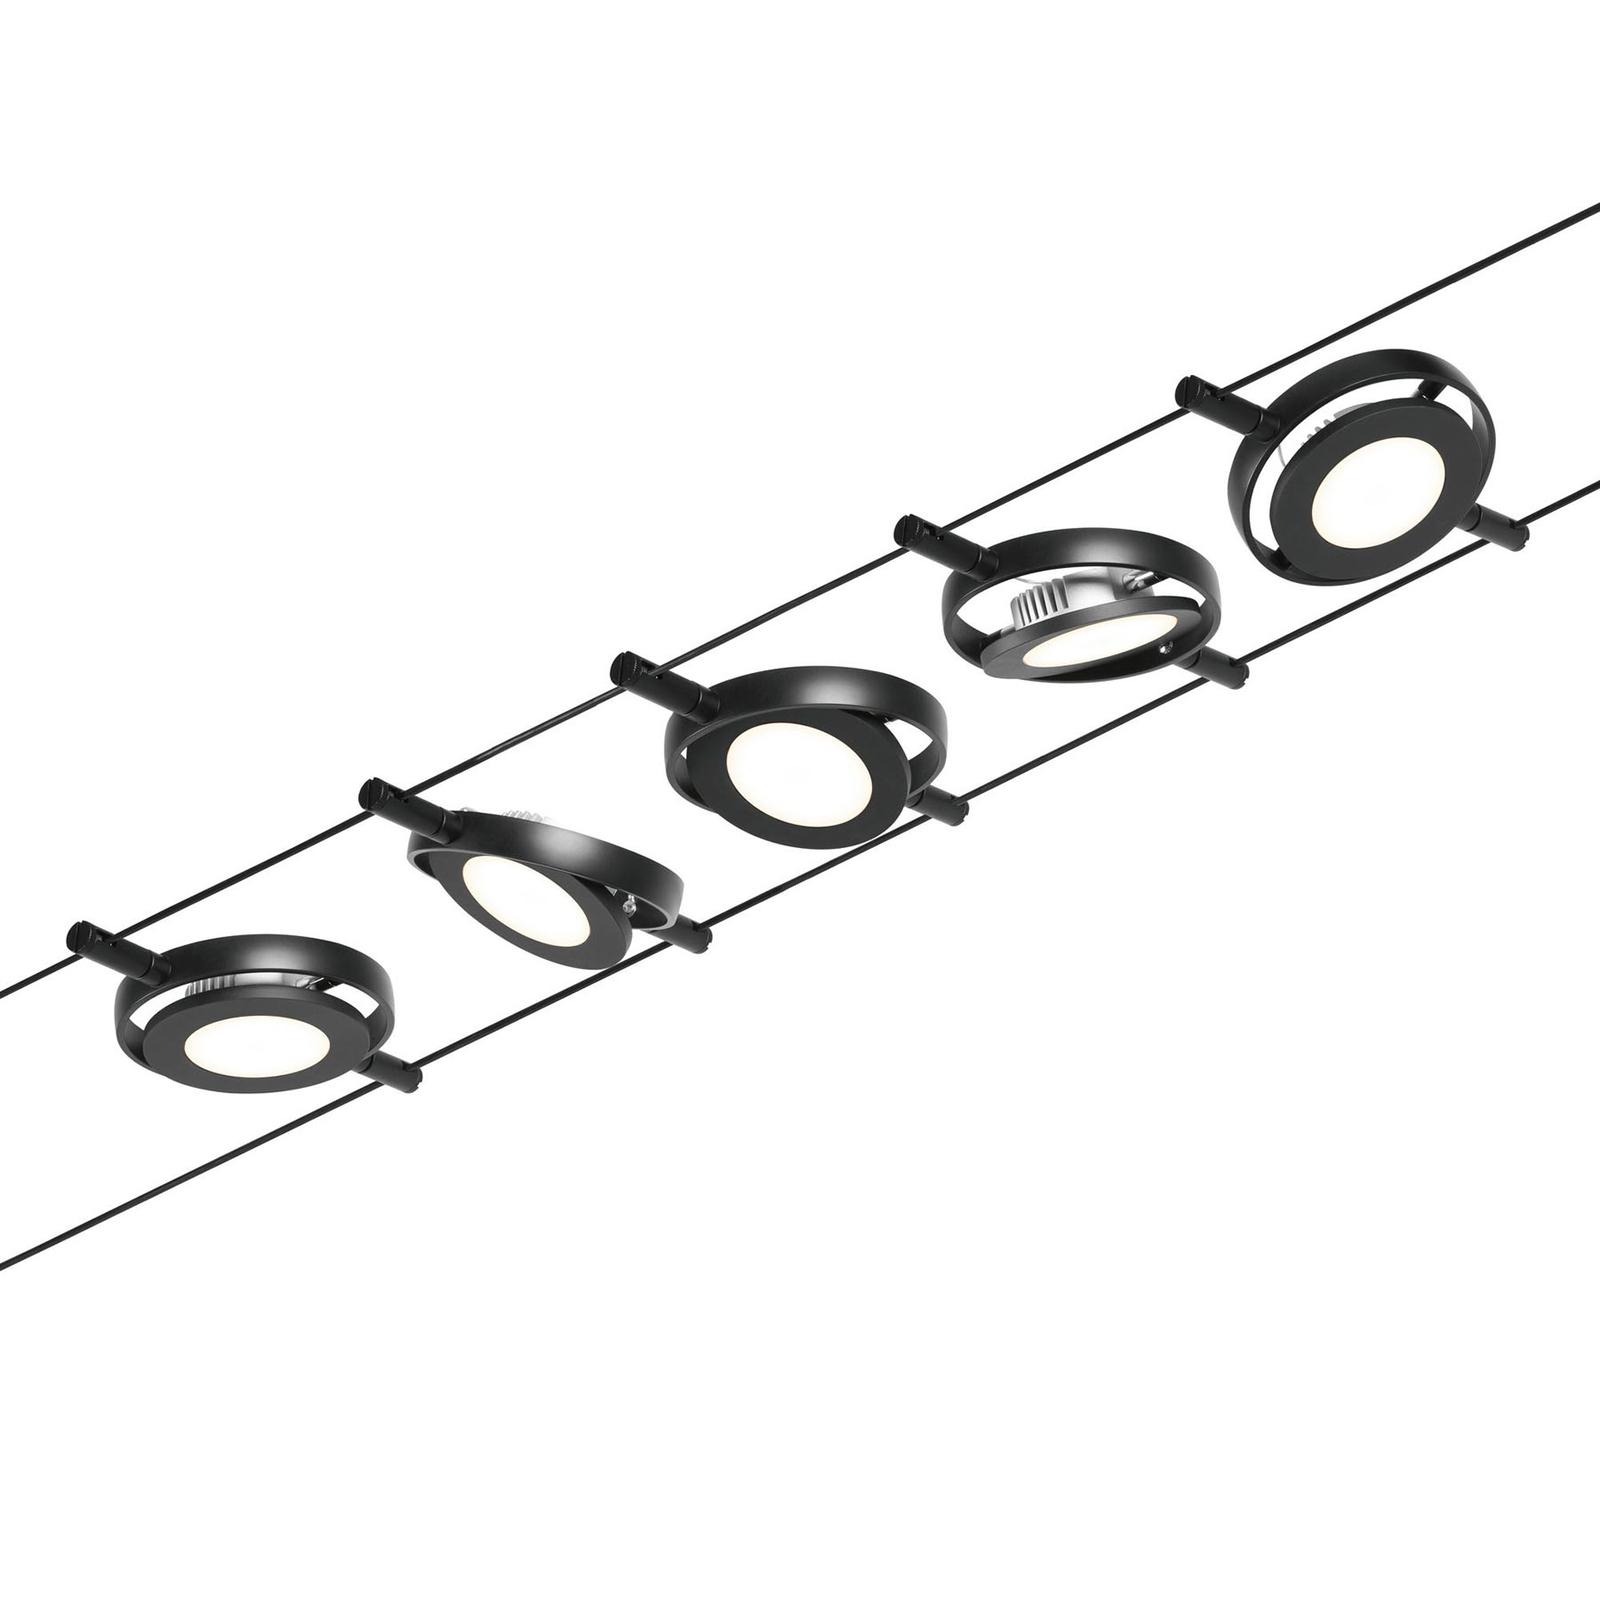 Paulmann Wire RoundMac LED-vaiersystem 5-lk. svart